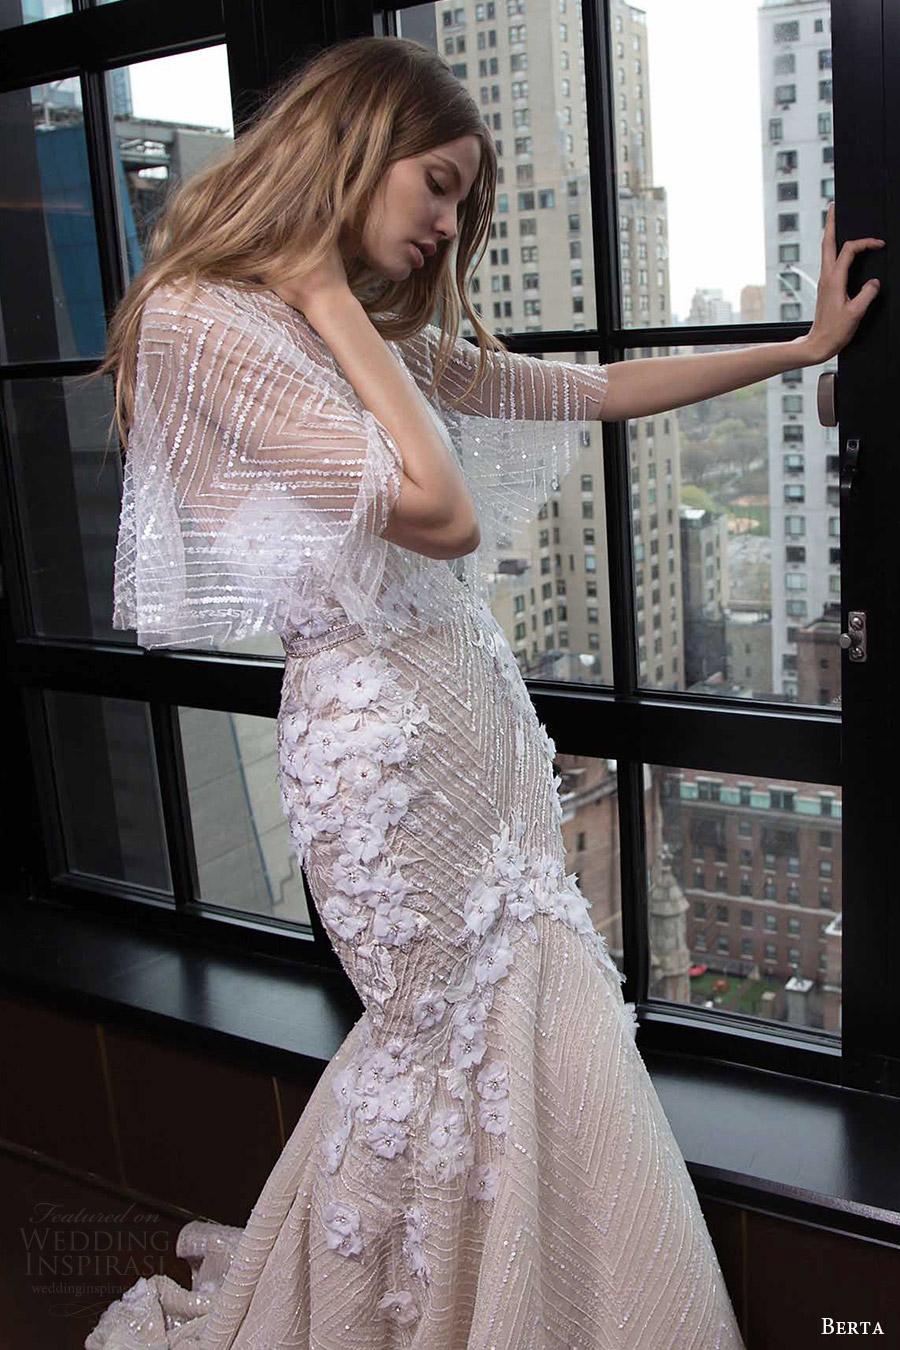 berta bridal fall 2016 strapless sweetheart trumpet wedding dress (16 104) fv illusion cape